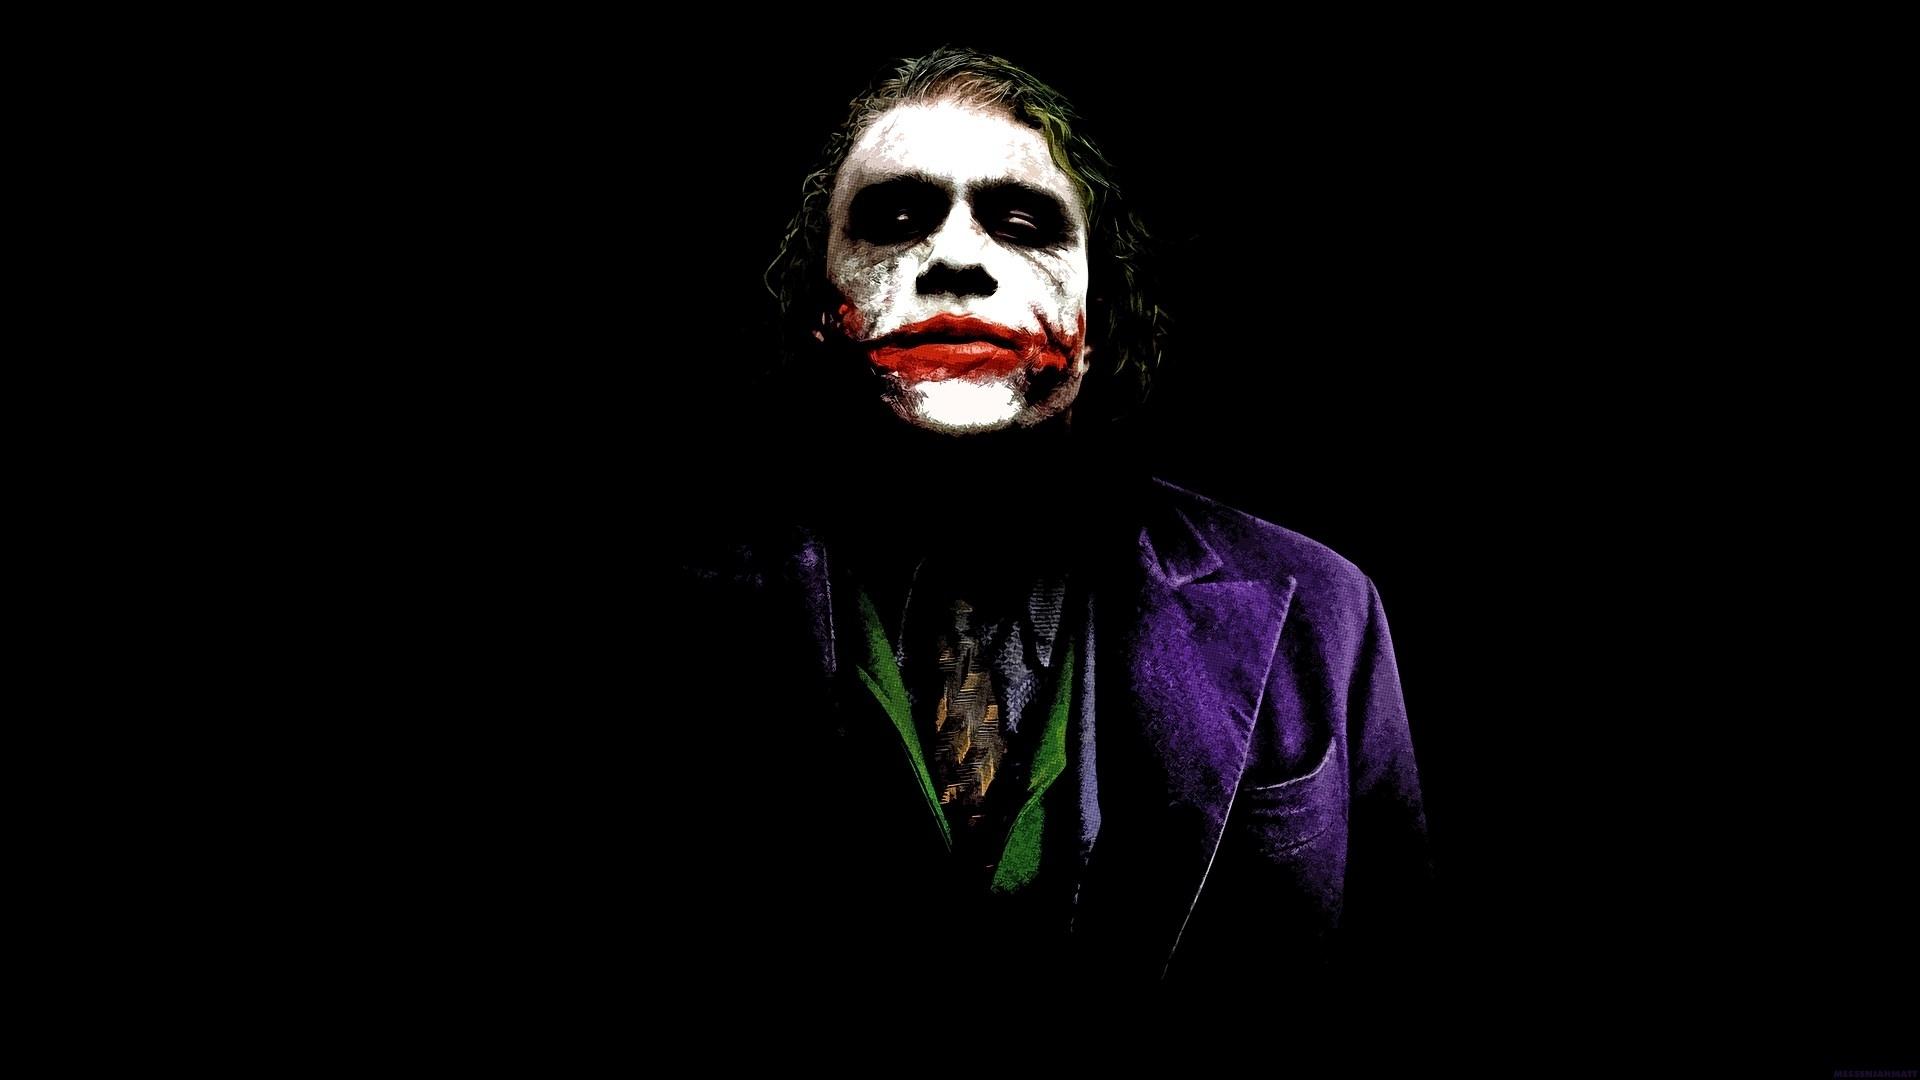 10 Top Heath Ledger Joker Wallpapers Full Hd 1080p For Pc Background